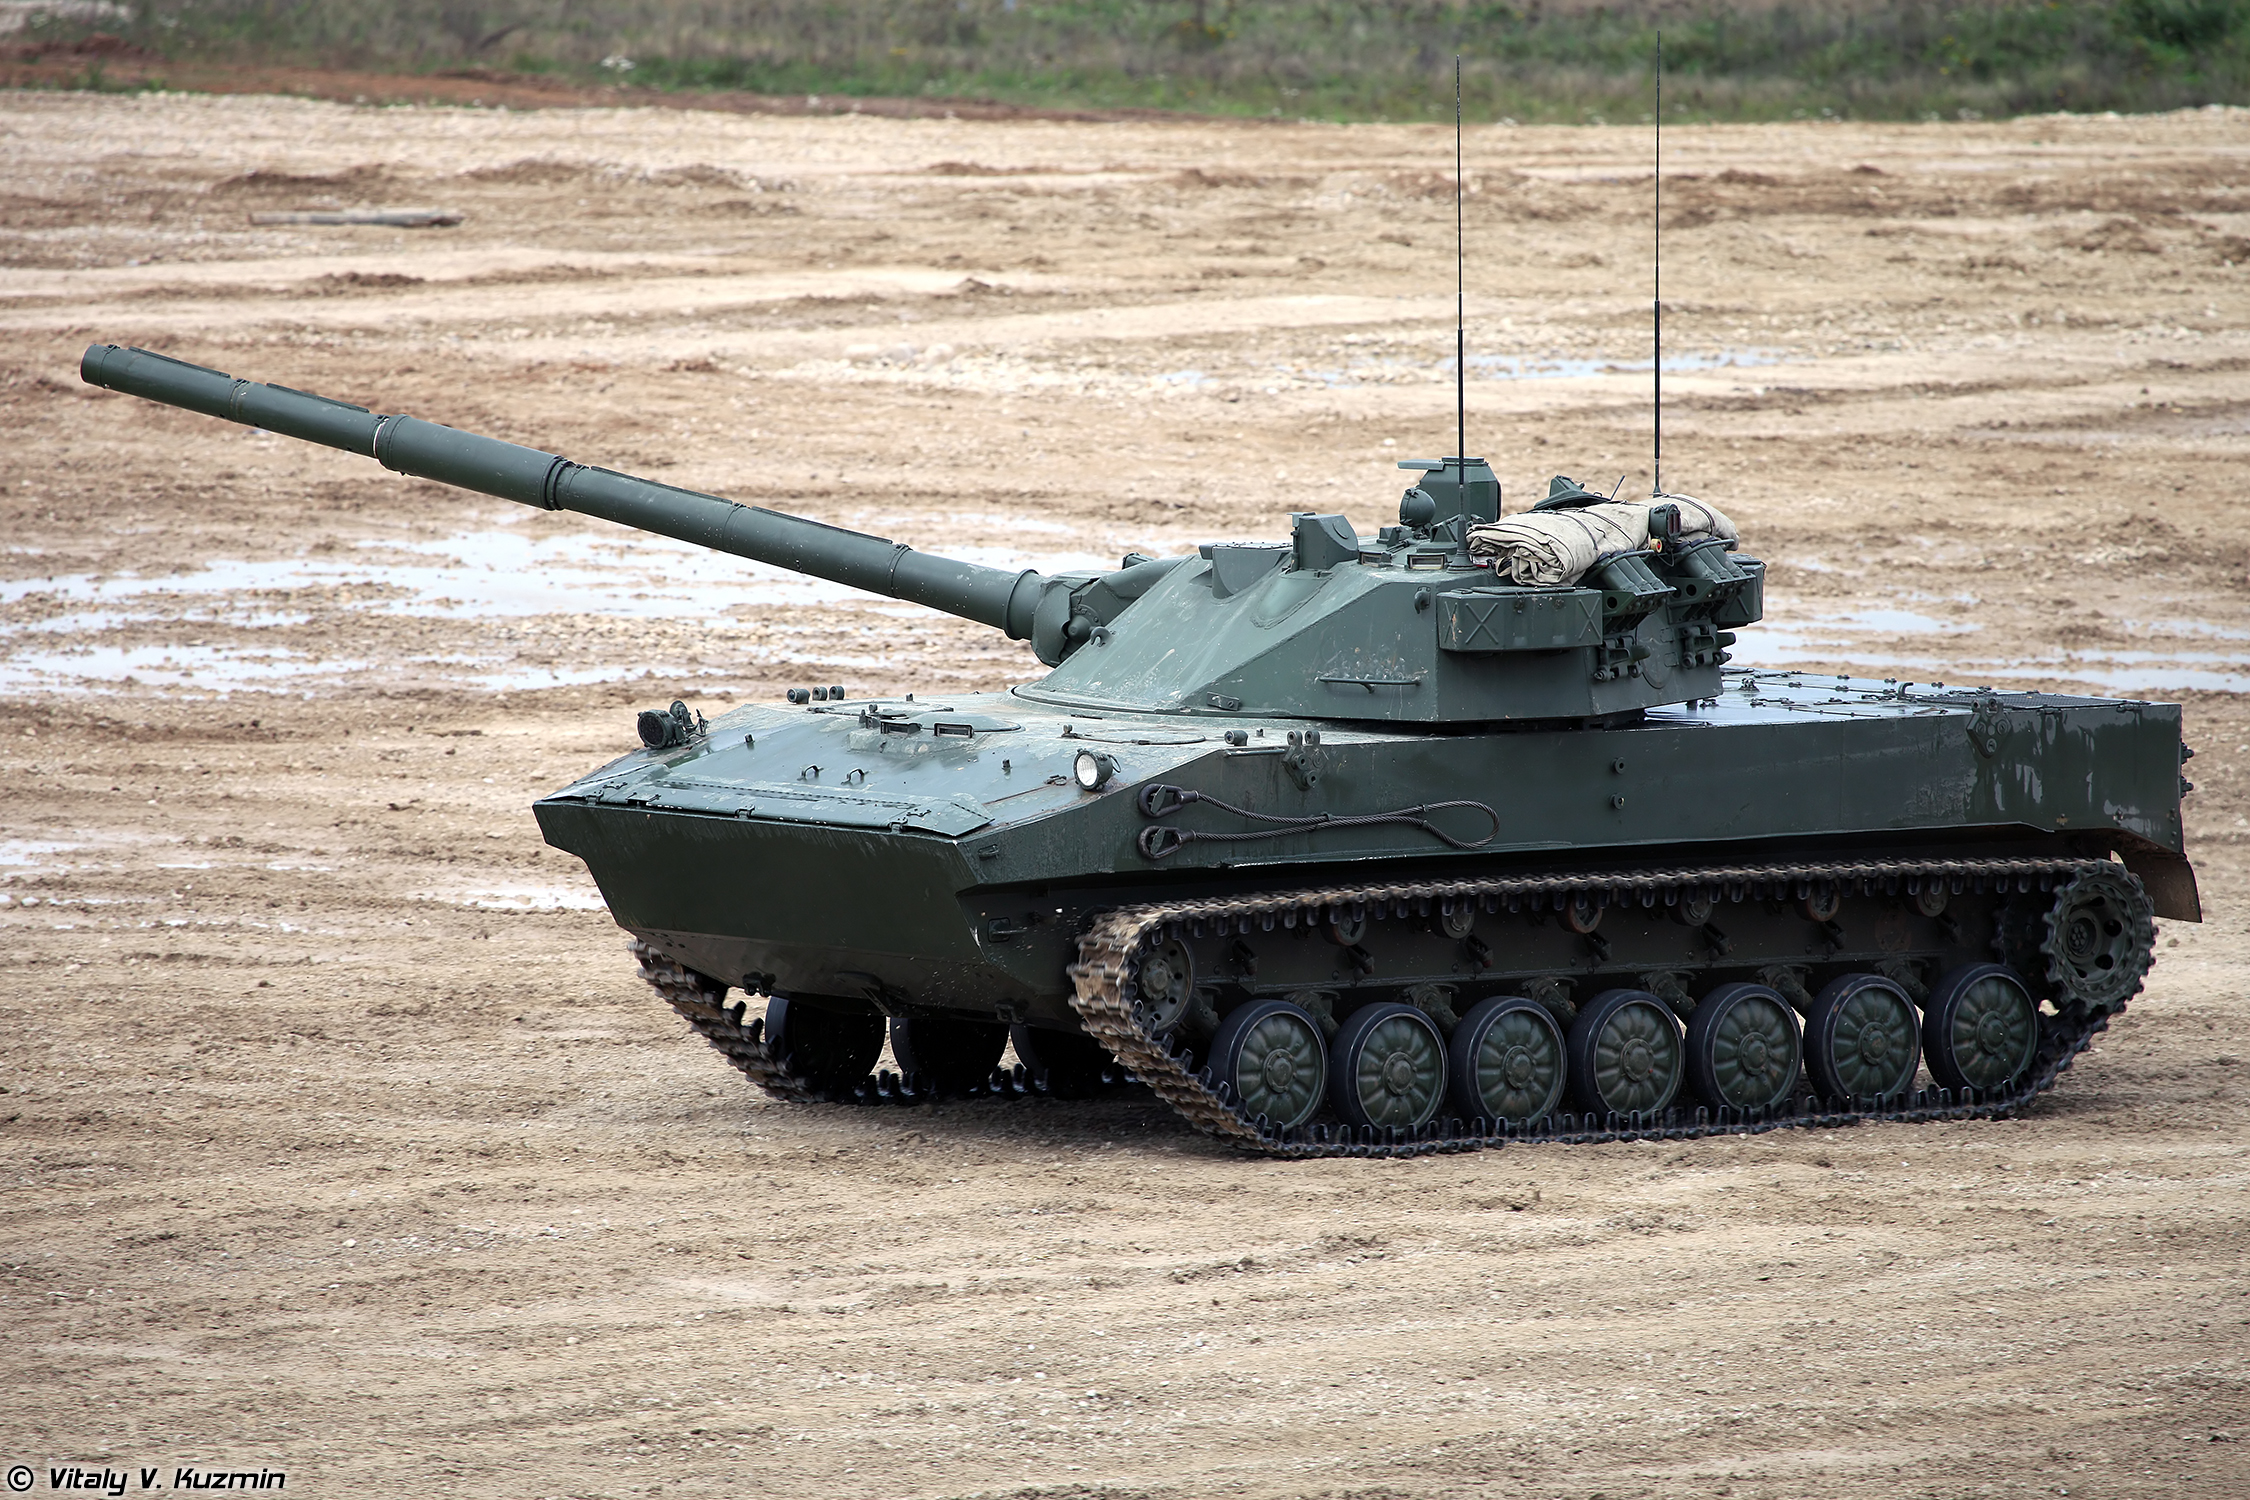 File:Army2016demo-020.jpg - Wikimedia Commons